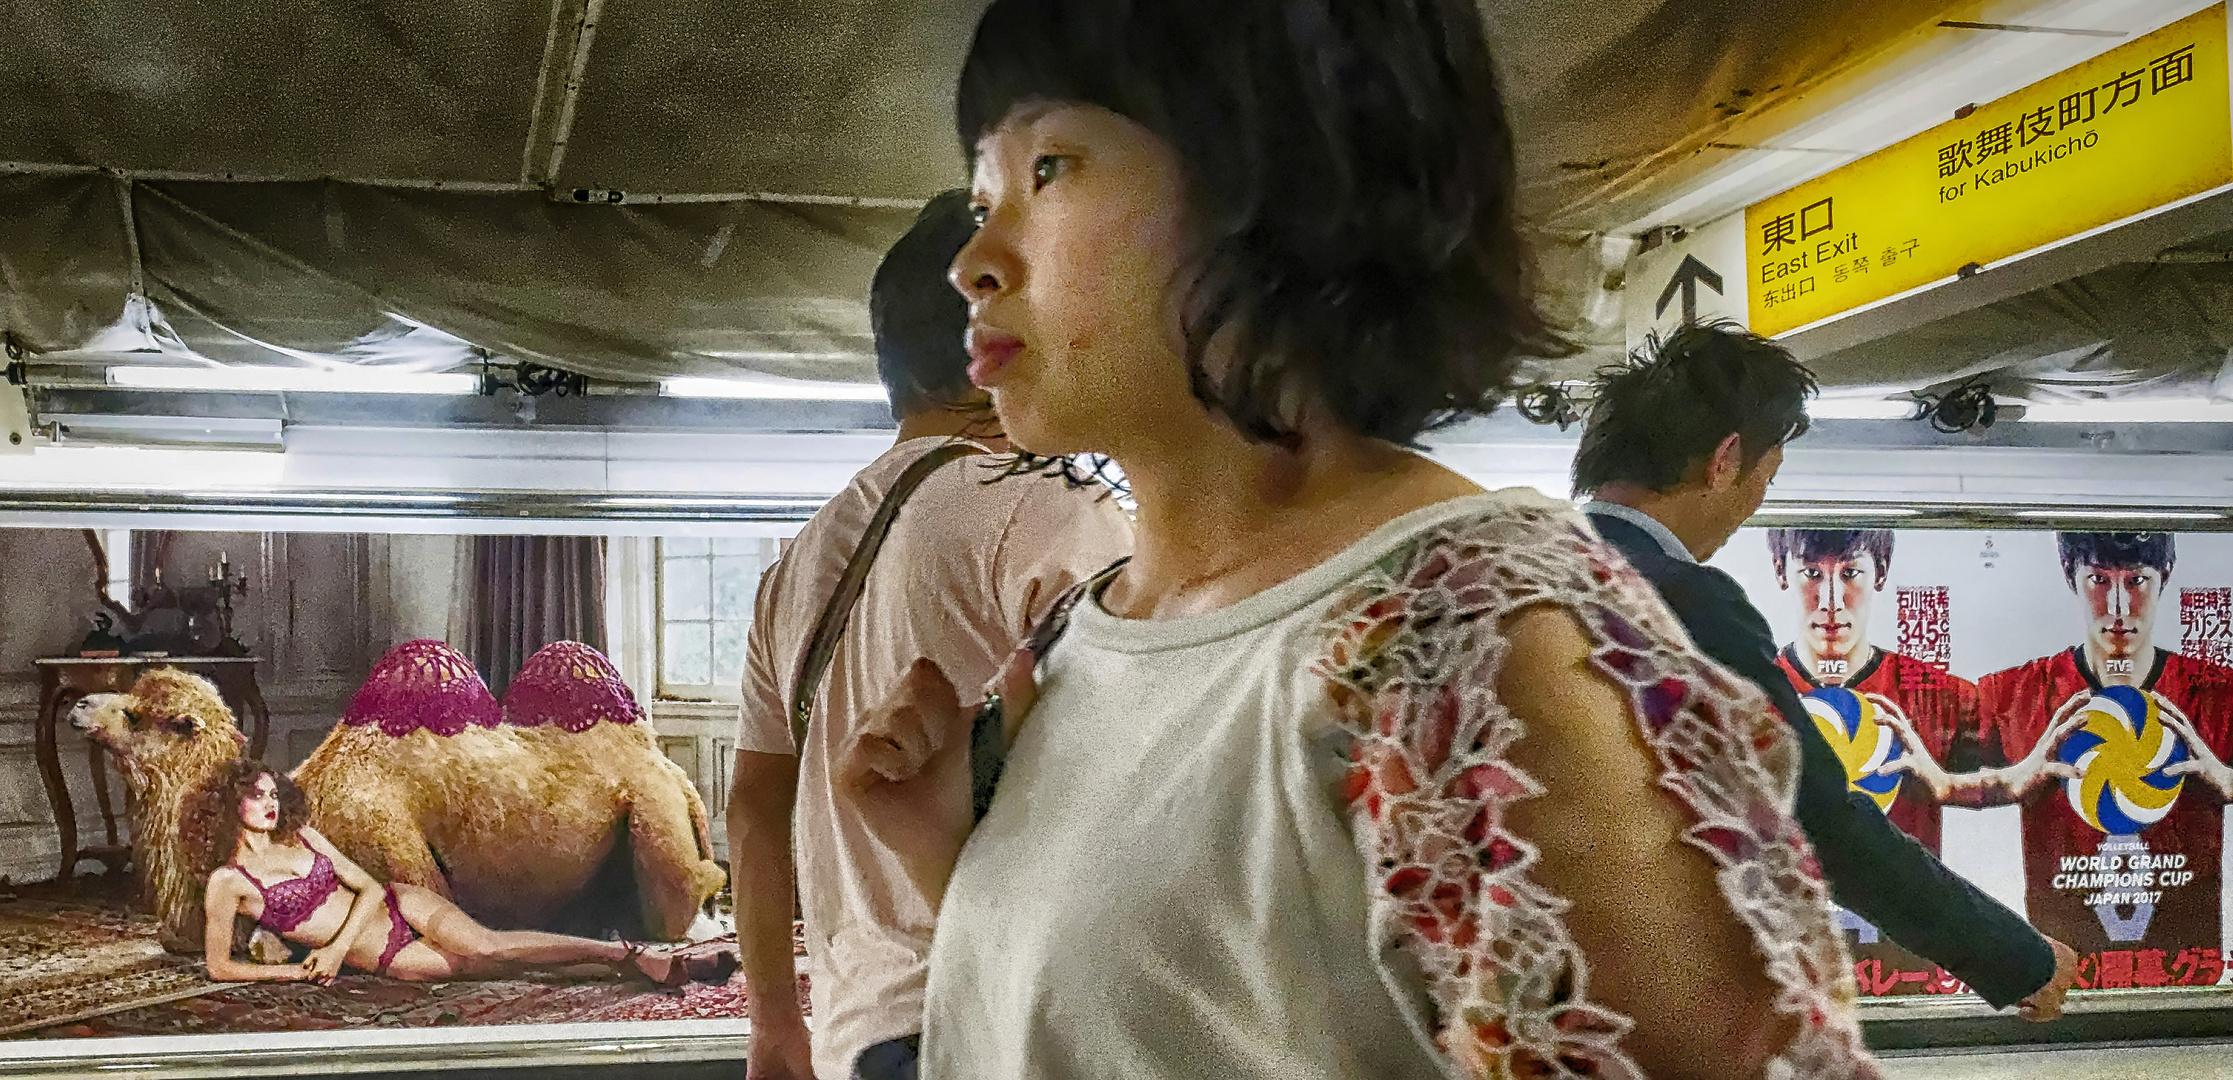 How Japanese Women Envision Western Women